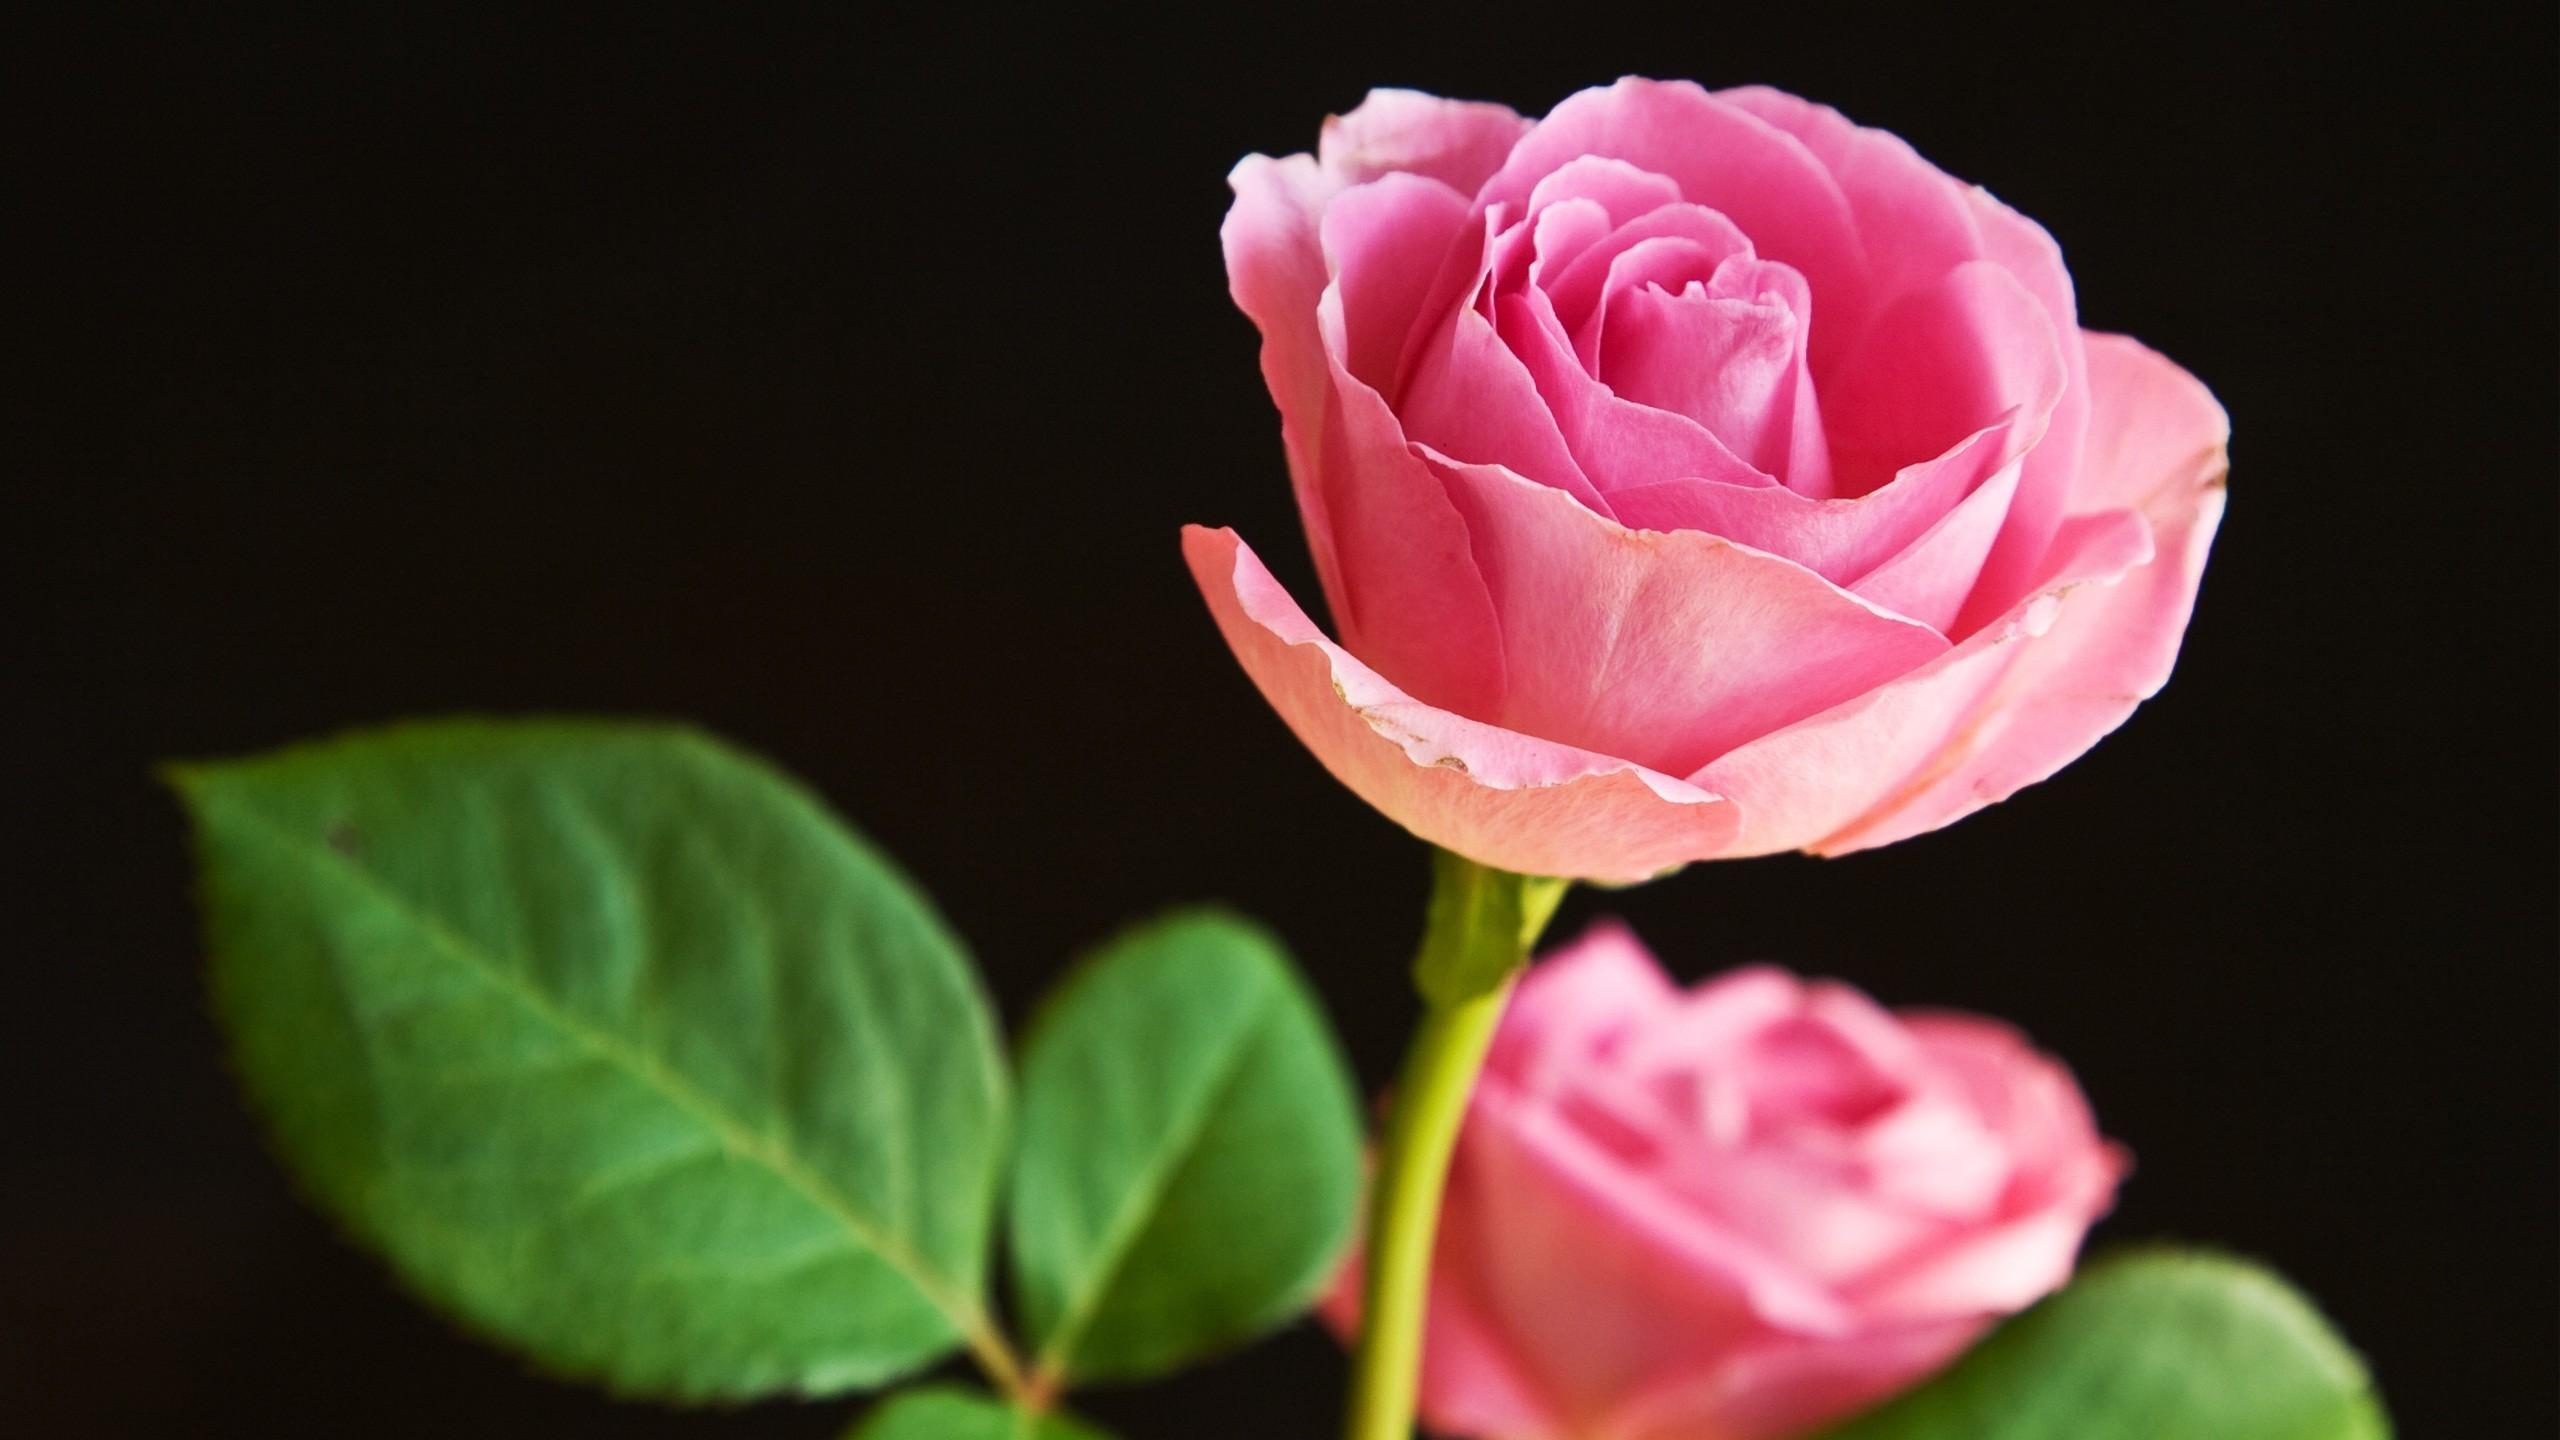 Pink rose flower wallpaper 52 images 2560x1440 2560x1440 beautiful rose flower wallpaper hd free download 1920x1200 izmirmasajfo